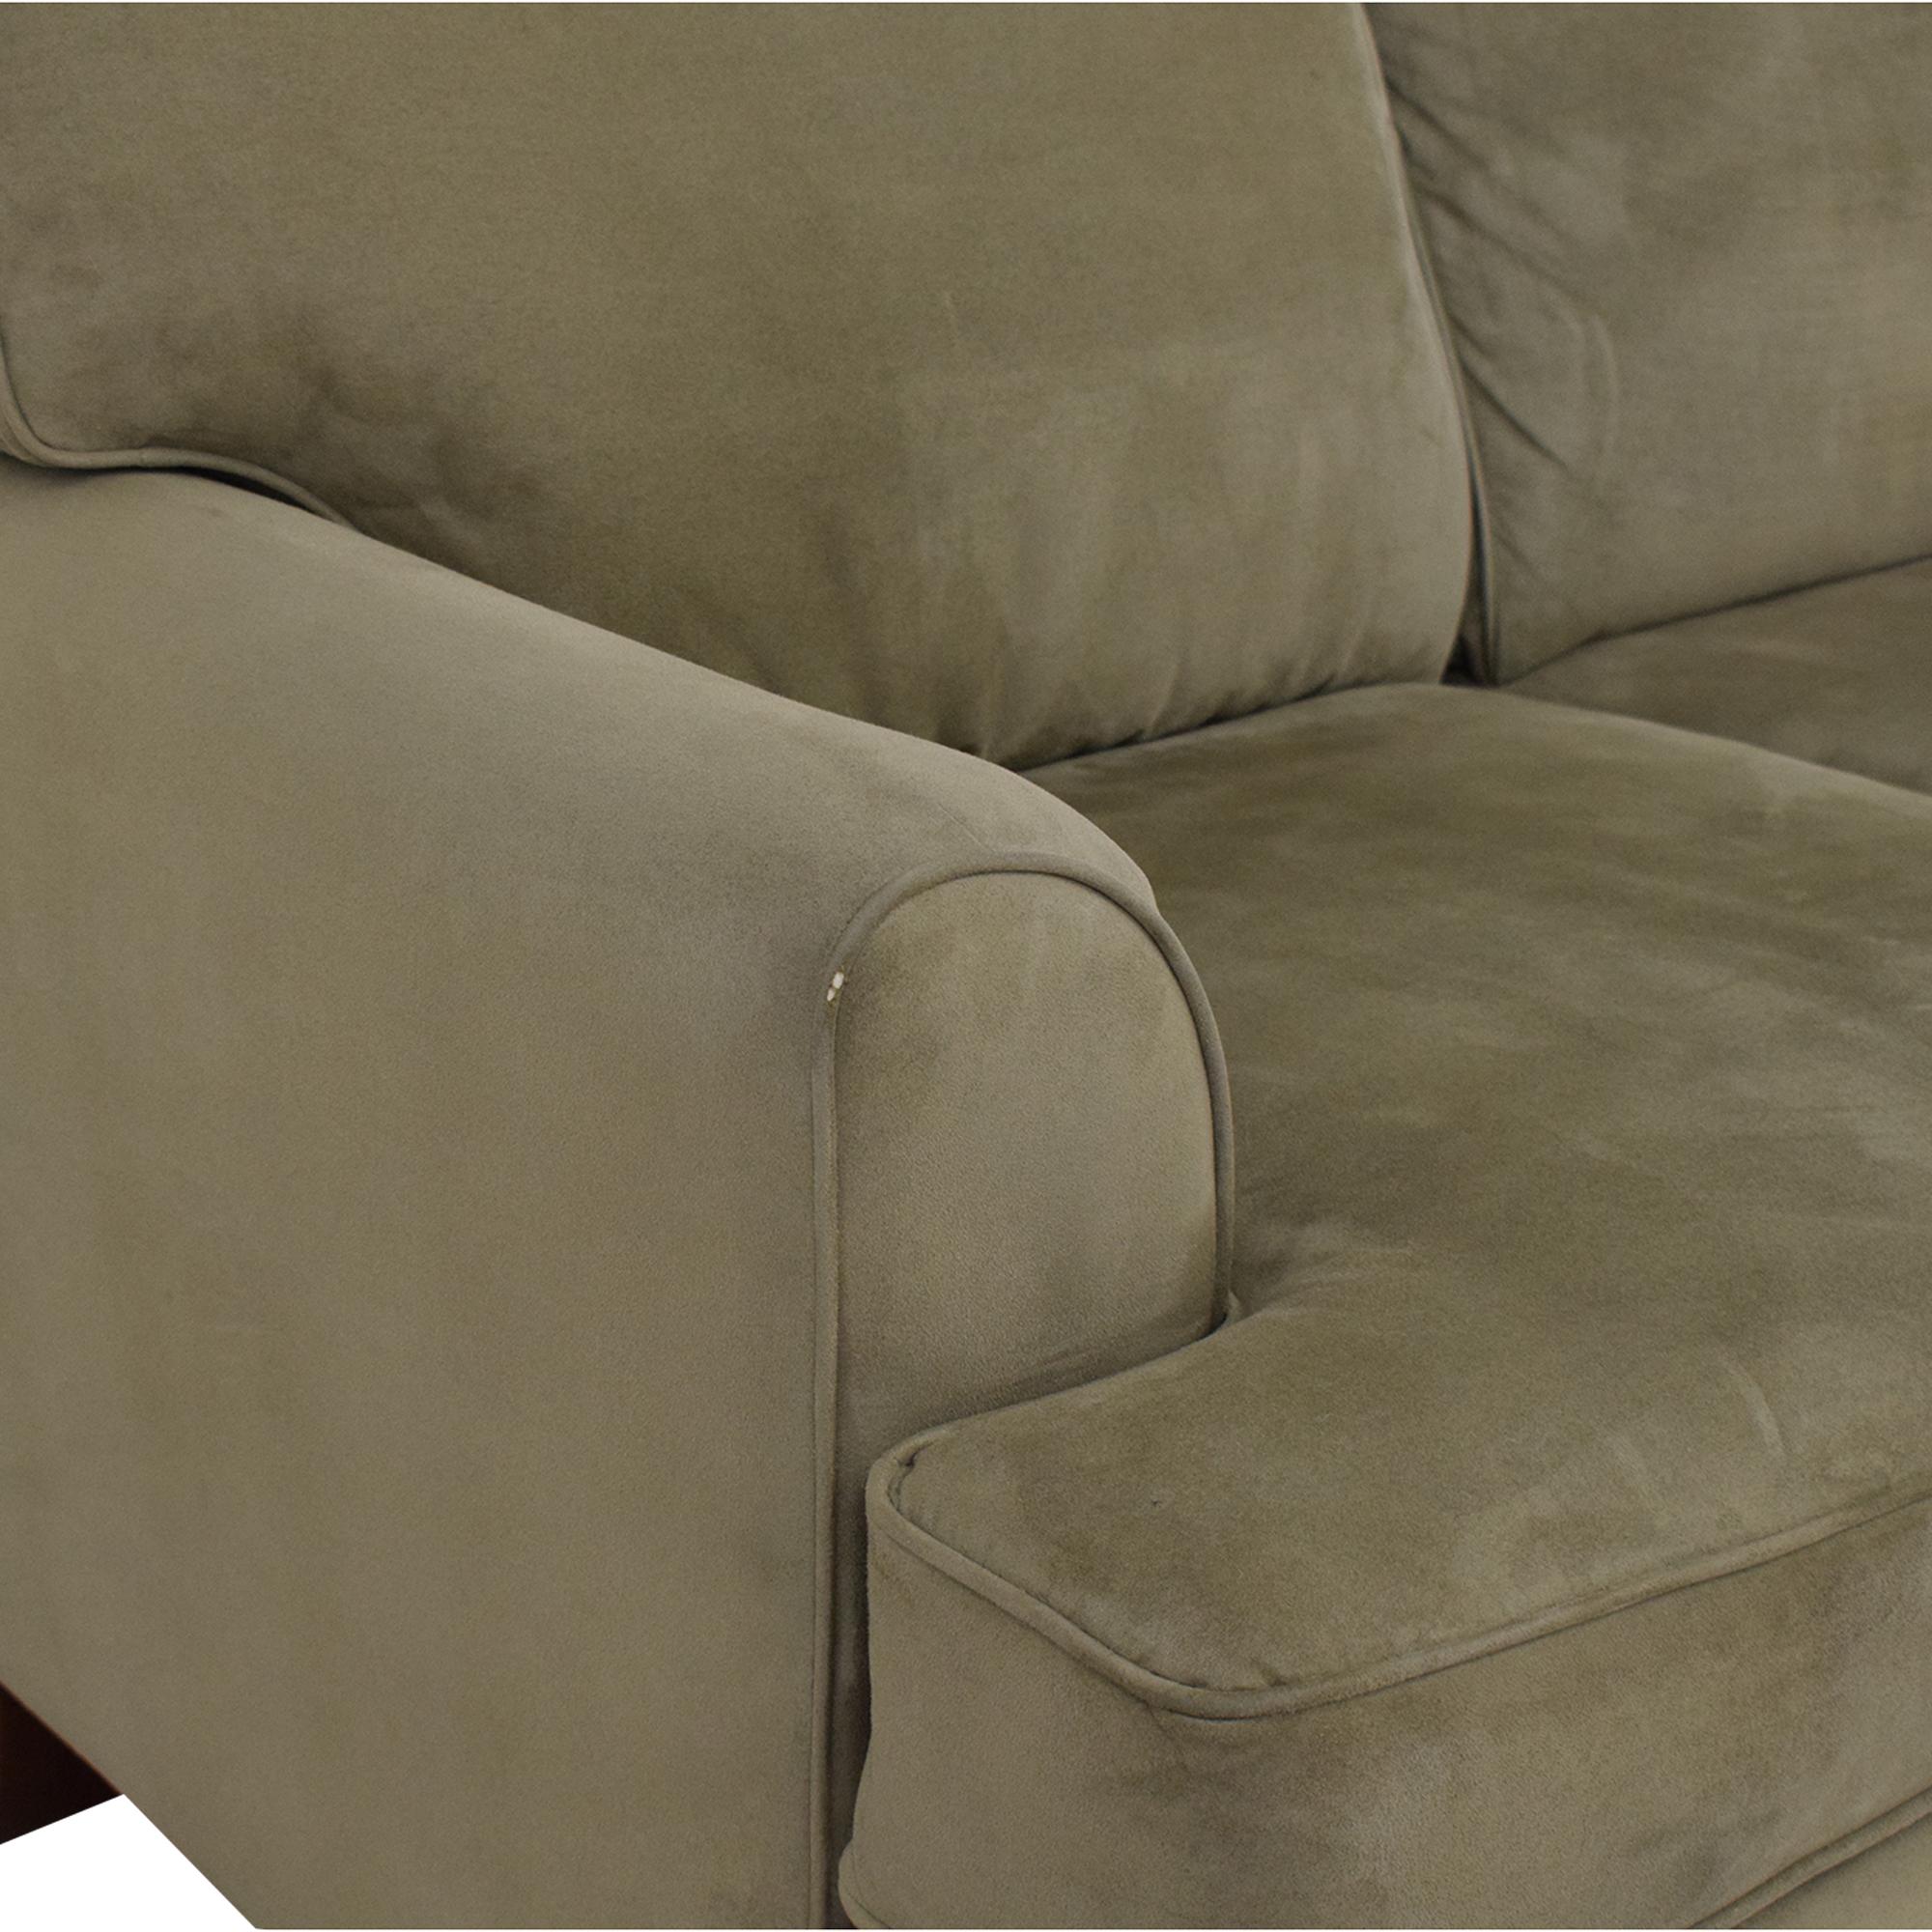 JC Penney Two Cushion Loveseat JC Penney